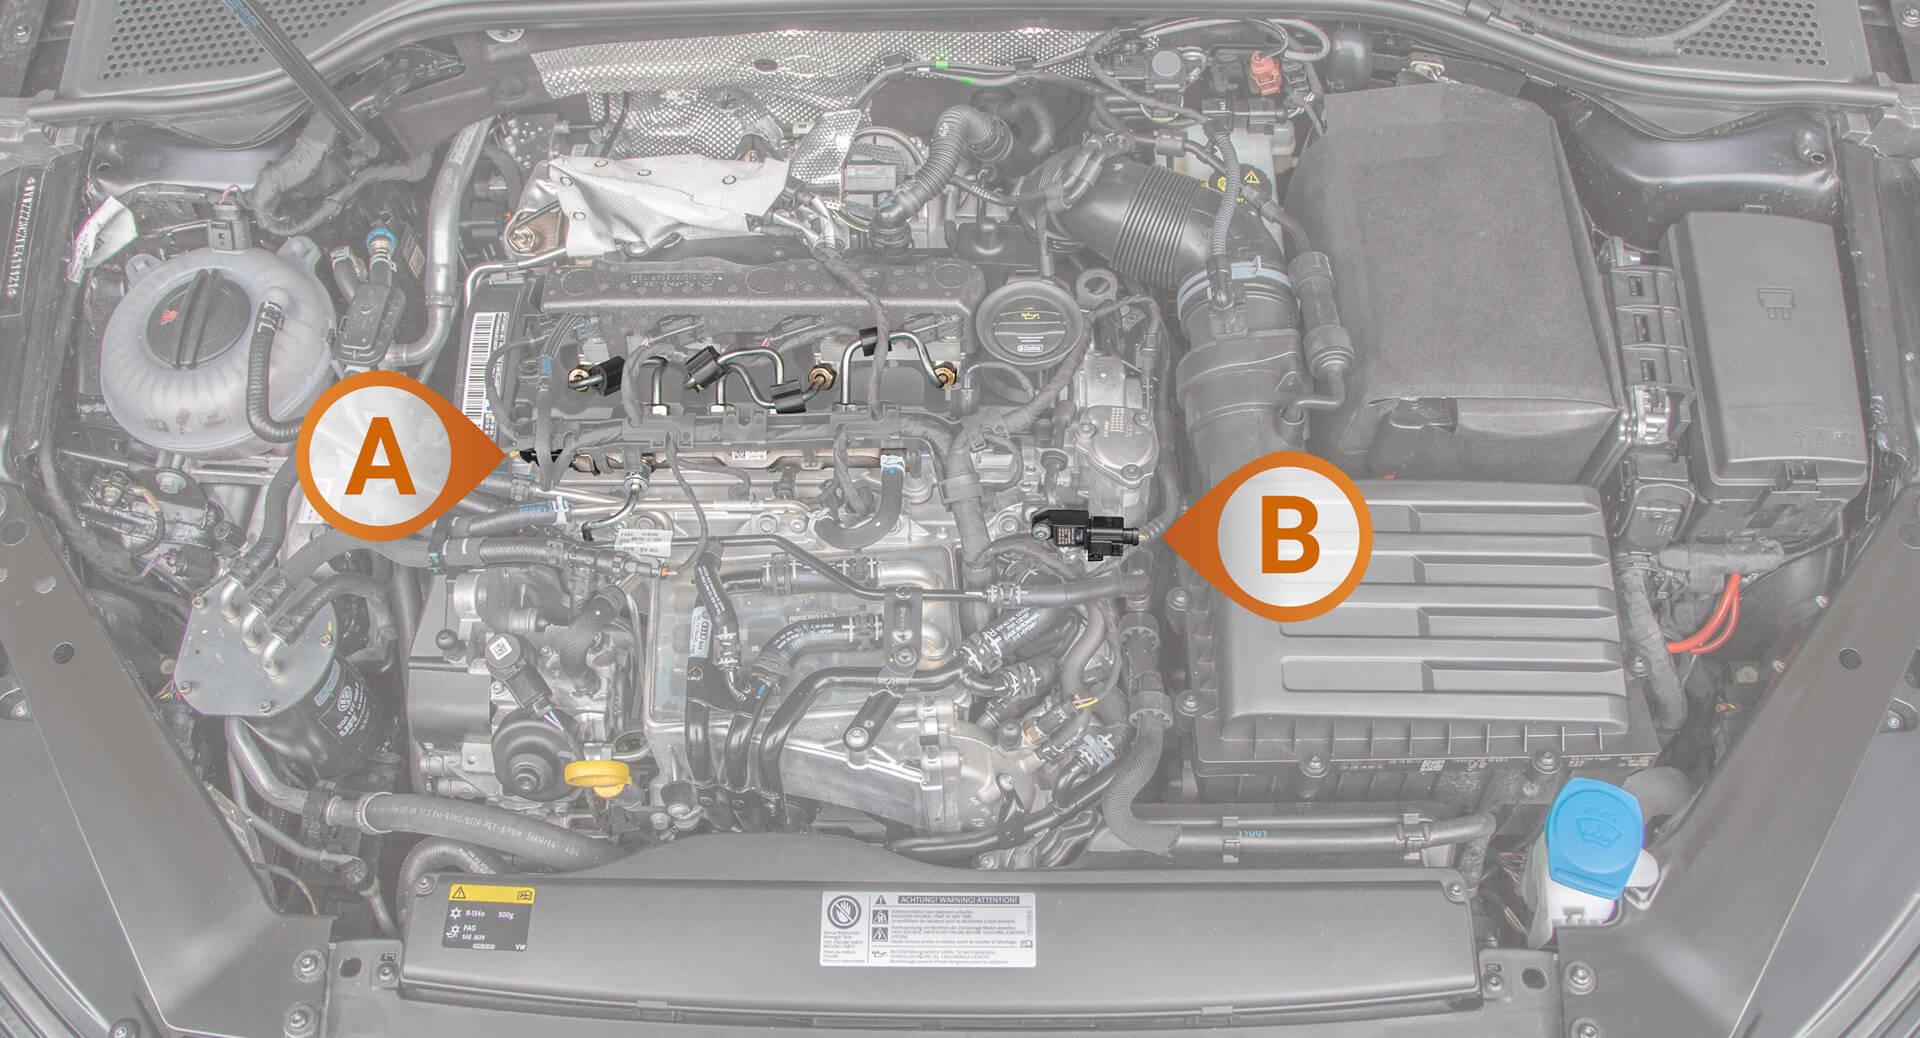 Chiptuning ChipPower OBD2 v3 f/ür SLC 250 D R172 204 PS 2016 Chip Tuning Diesel